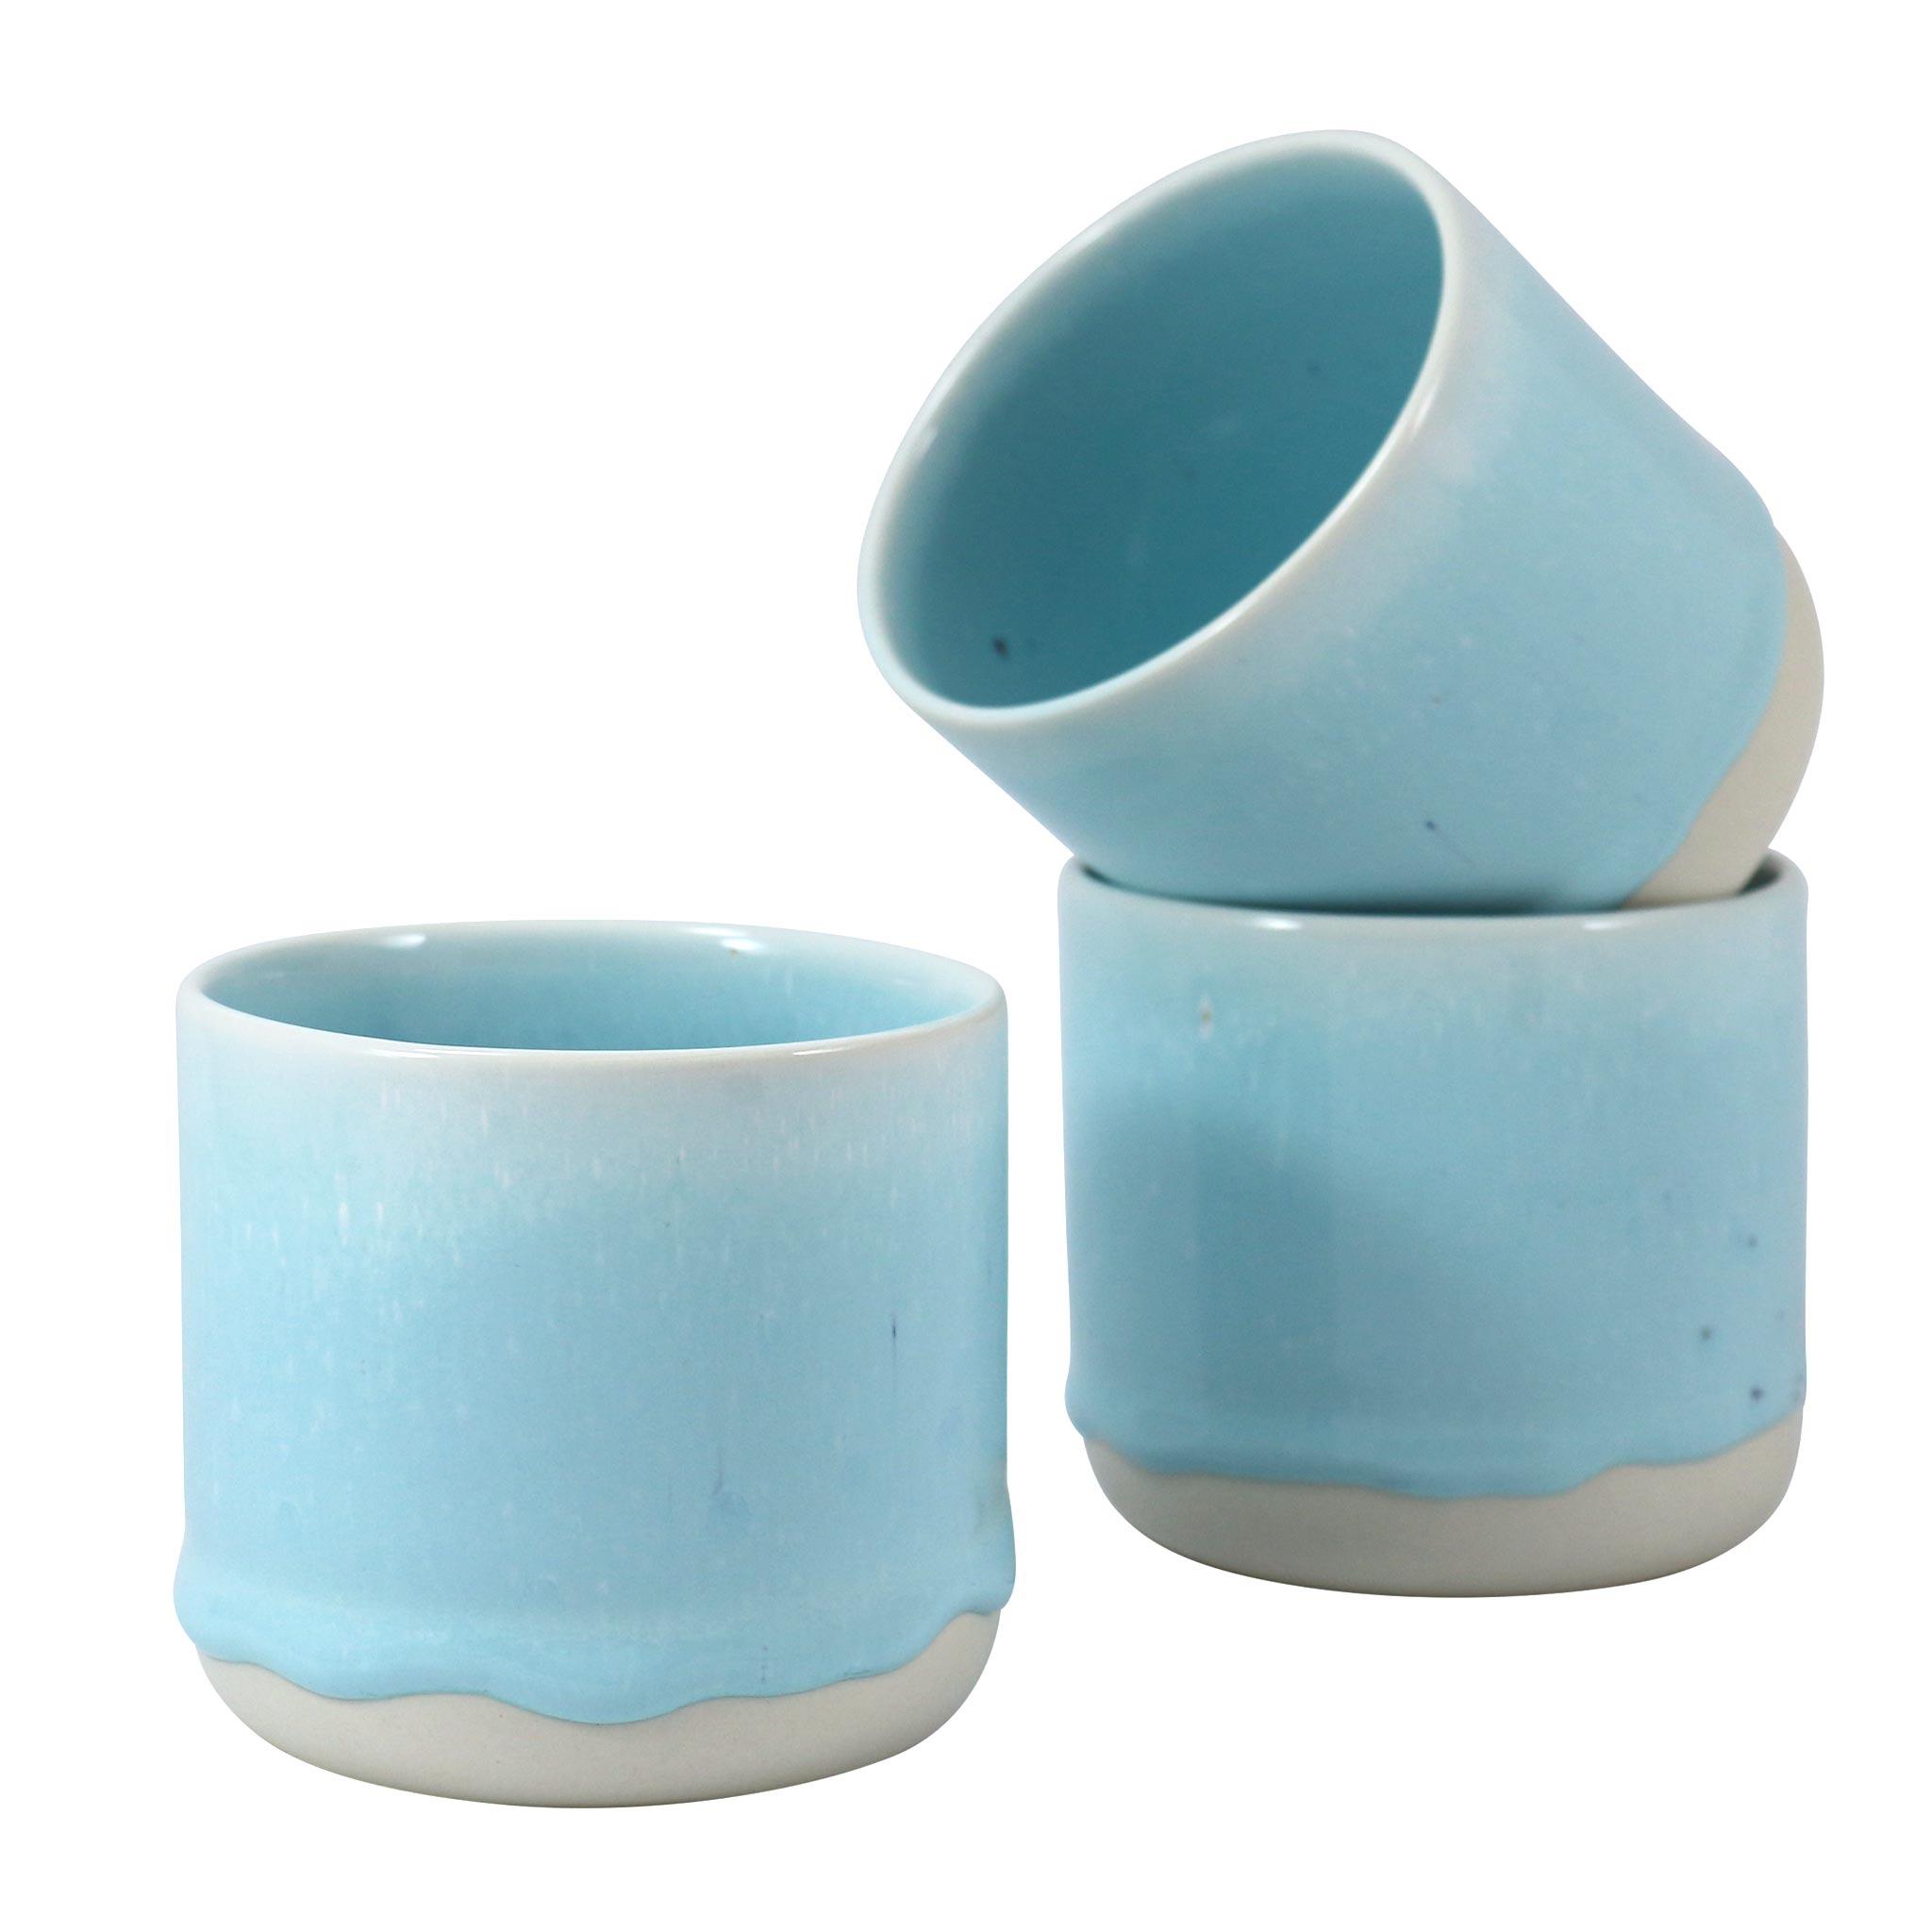 STUDIO ARHØJ - Quench mug, Blue Bubblegum